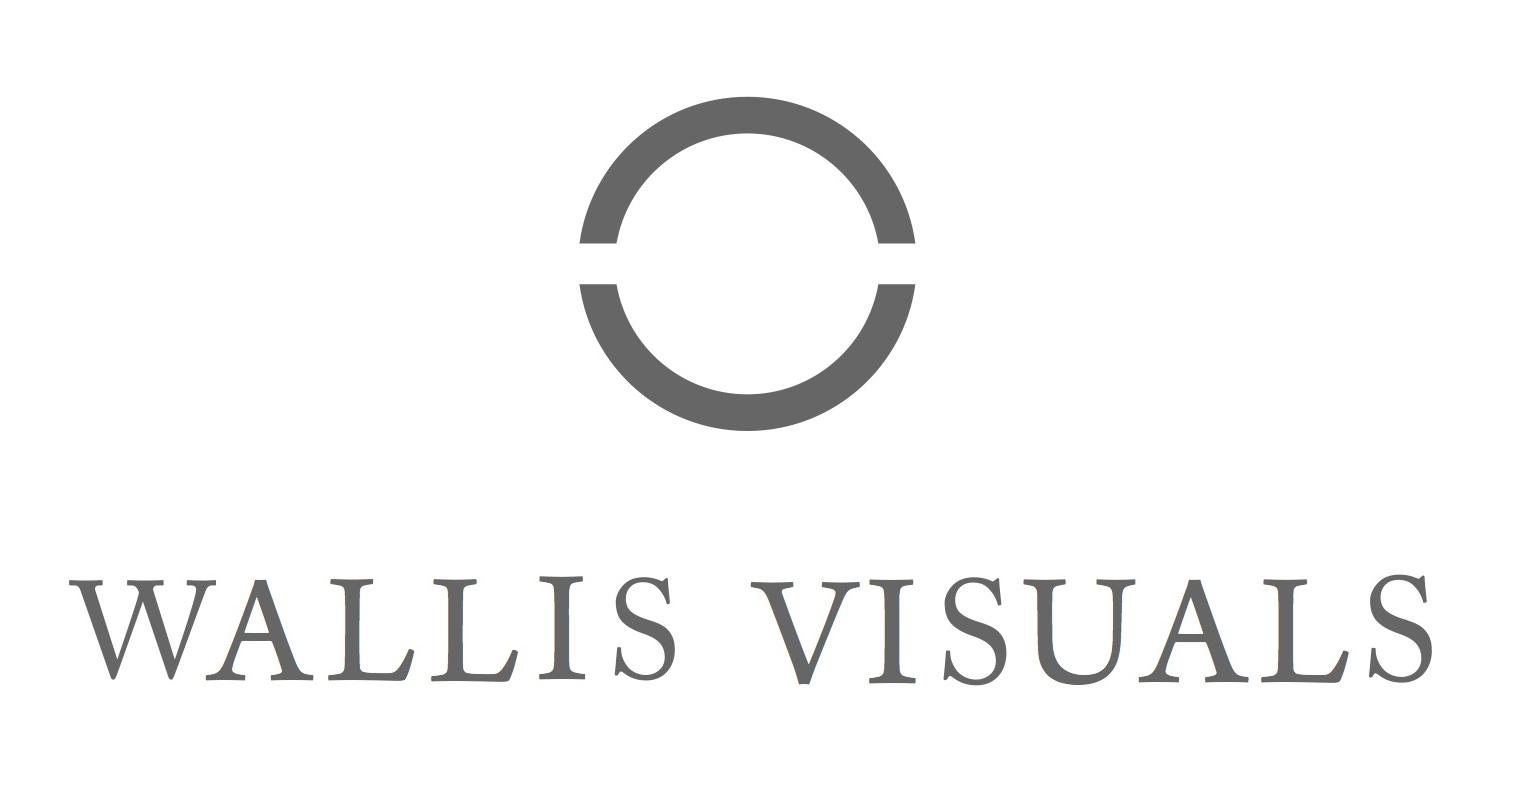 Wallis visuals logo.jpg